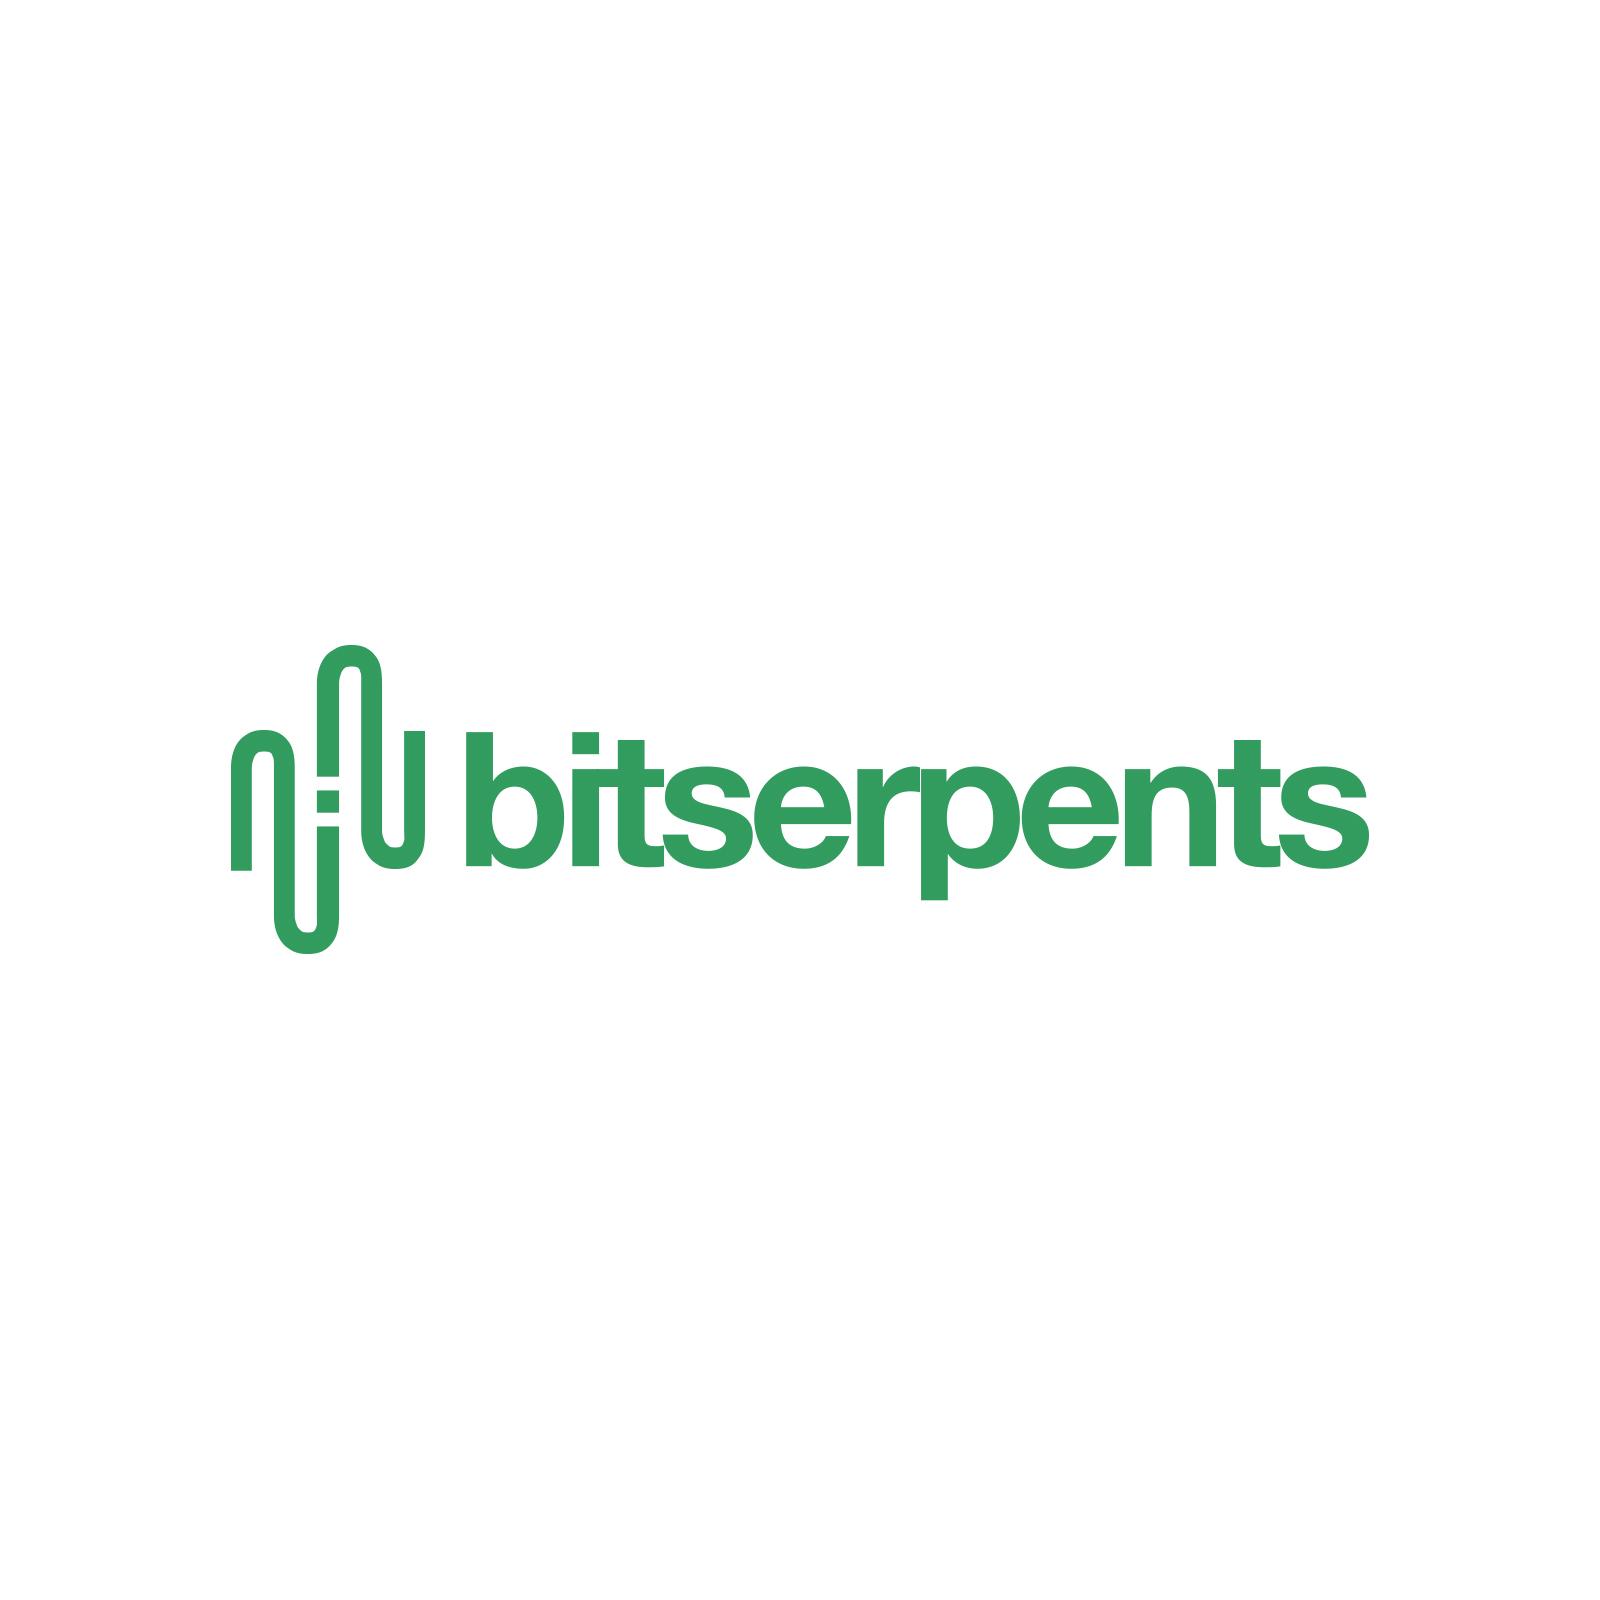 Bitserpents 2